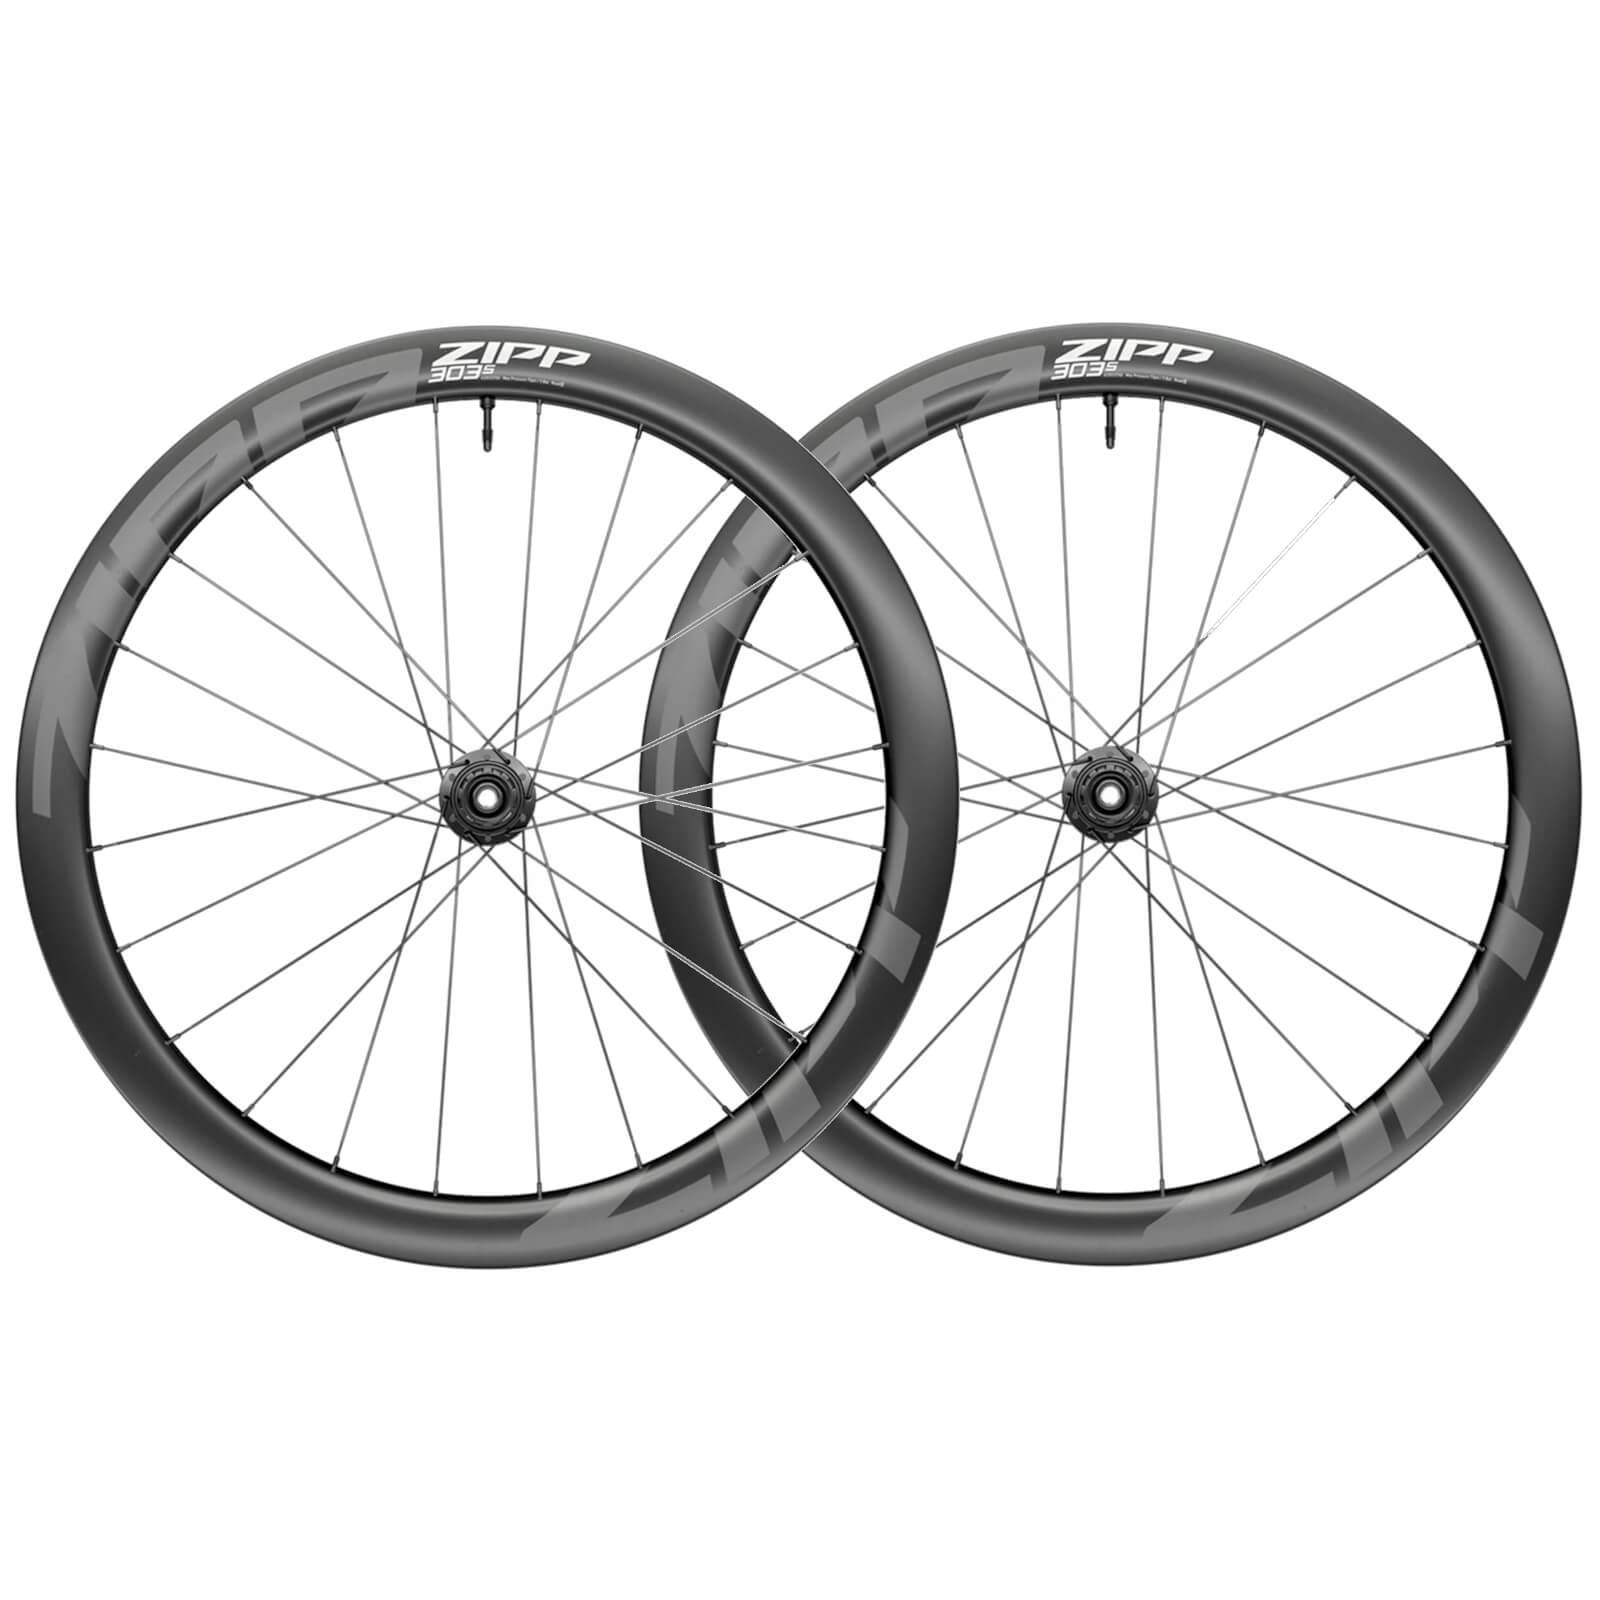 Zipp 303 S Carbon Tubeless Disc Brake Wheelset - Shimano/SRAM